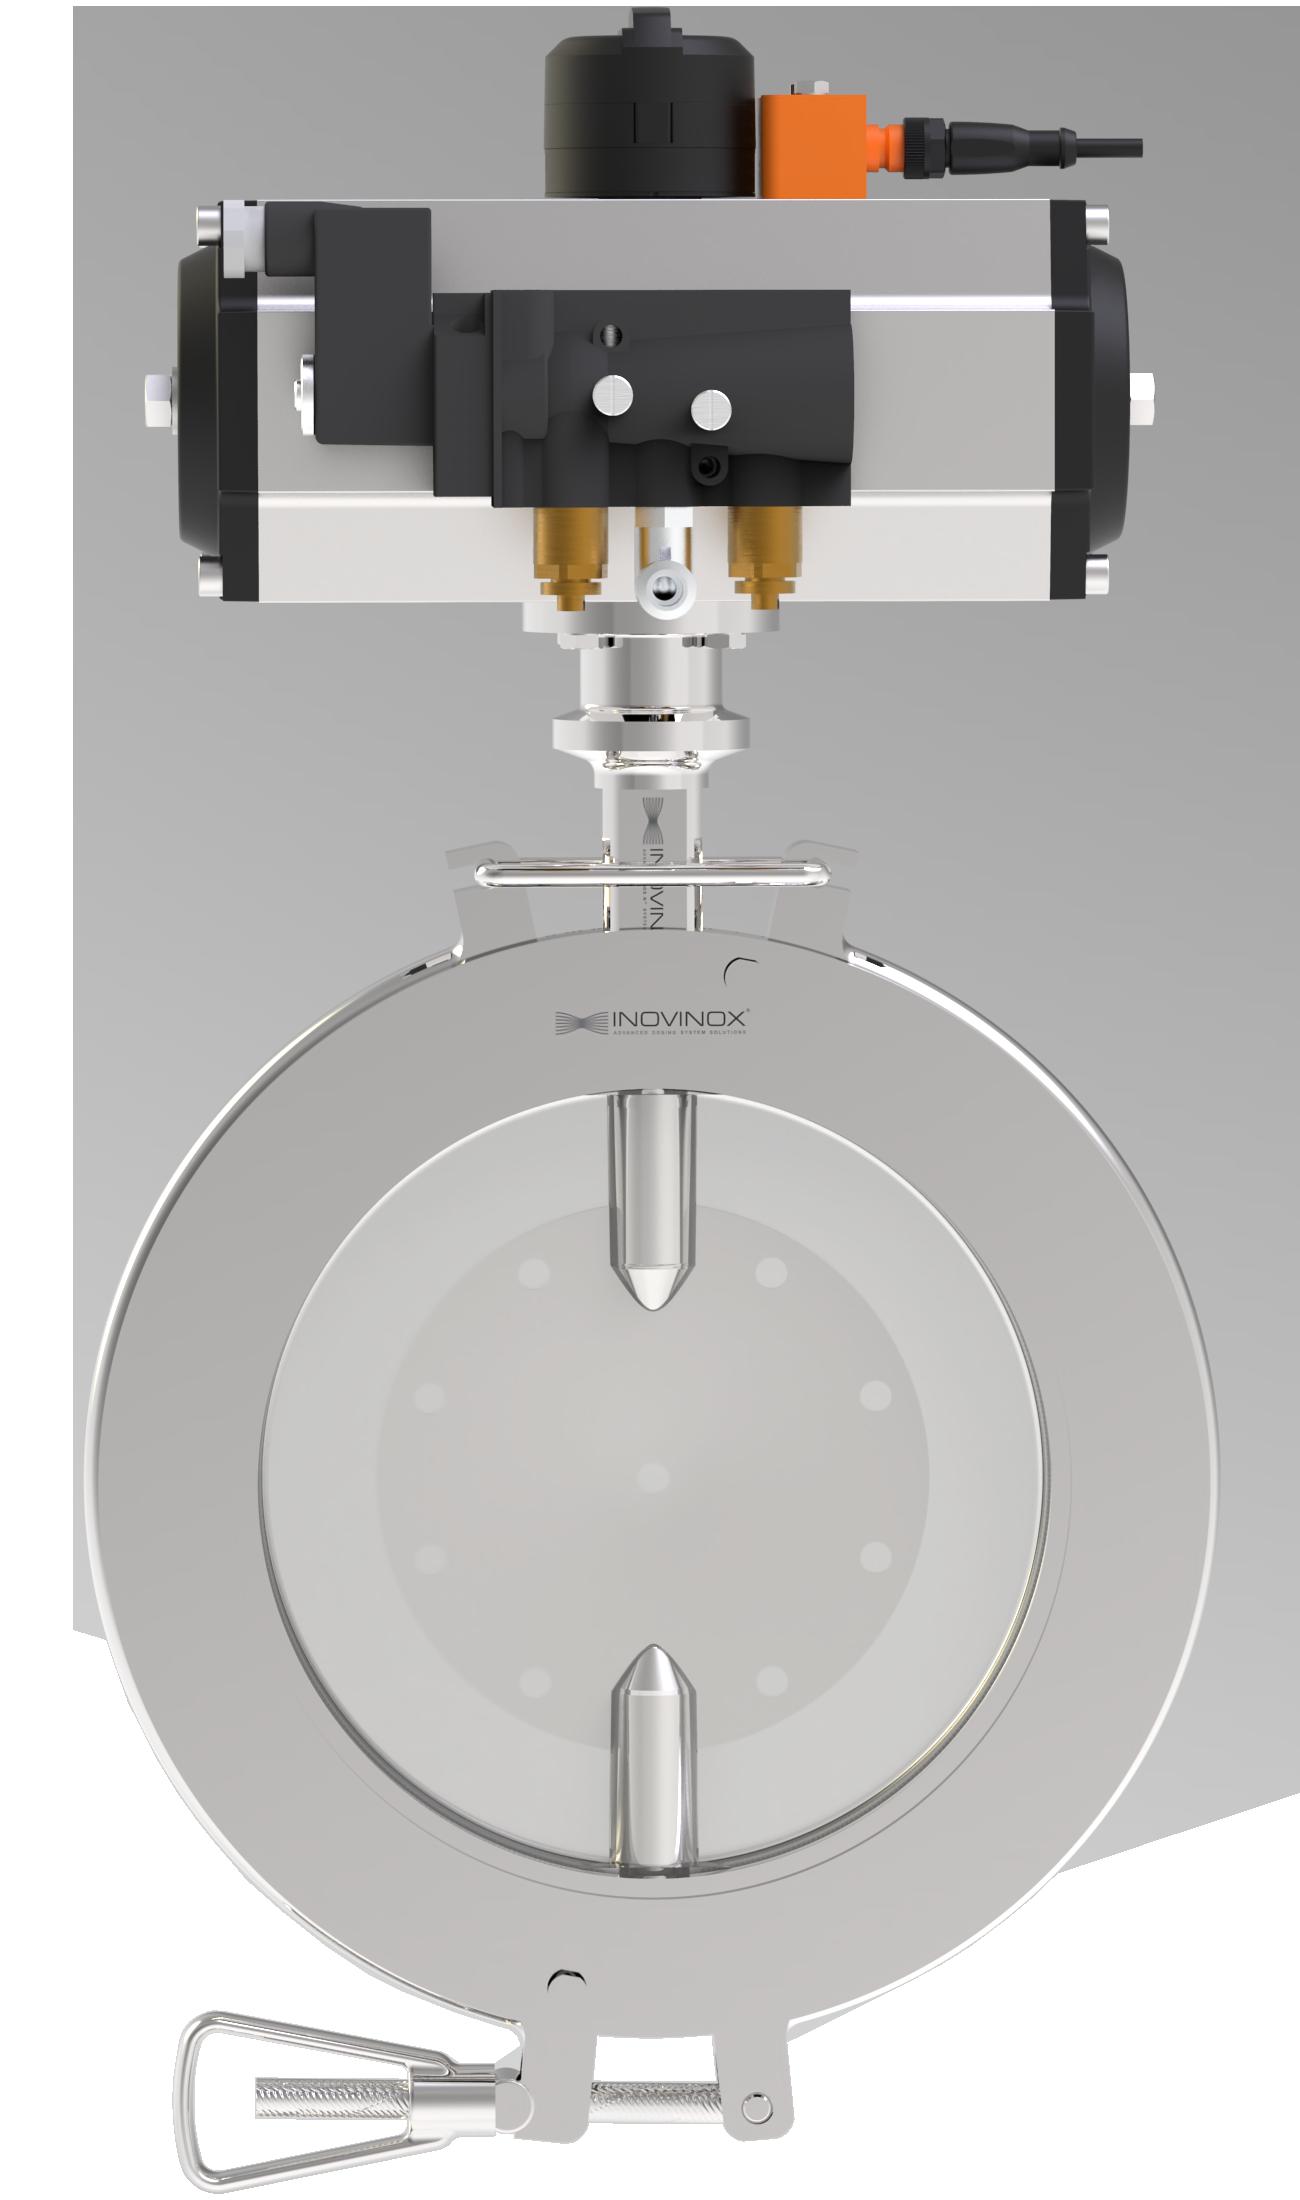 Flexivalve with actuator